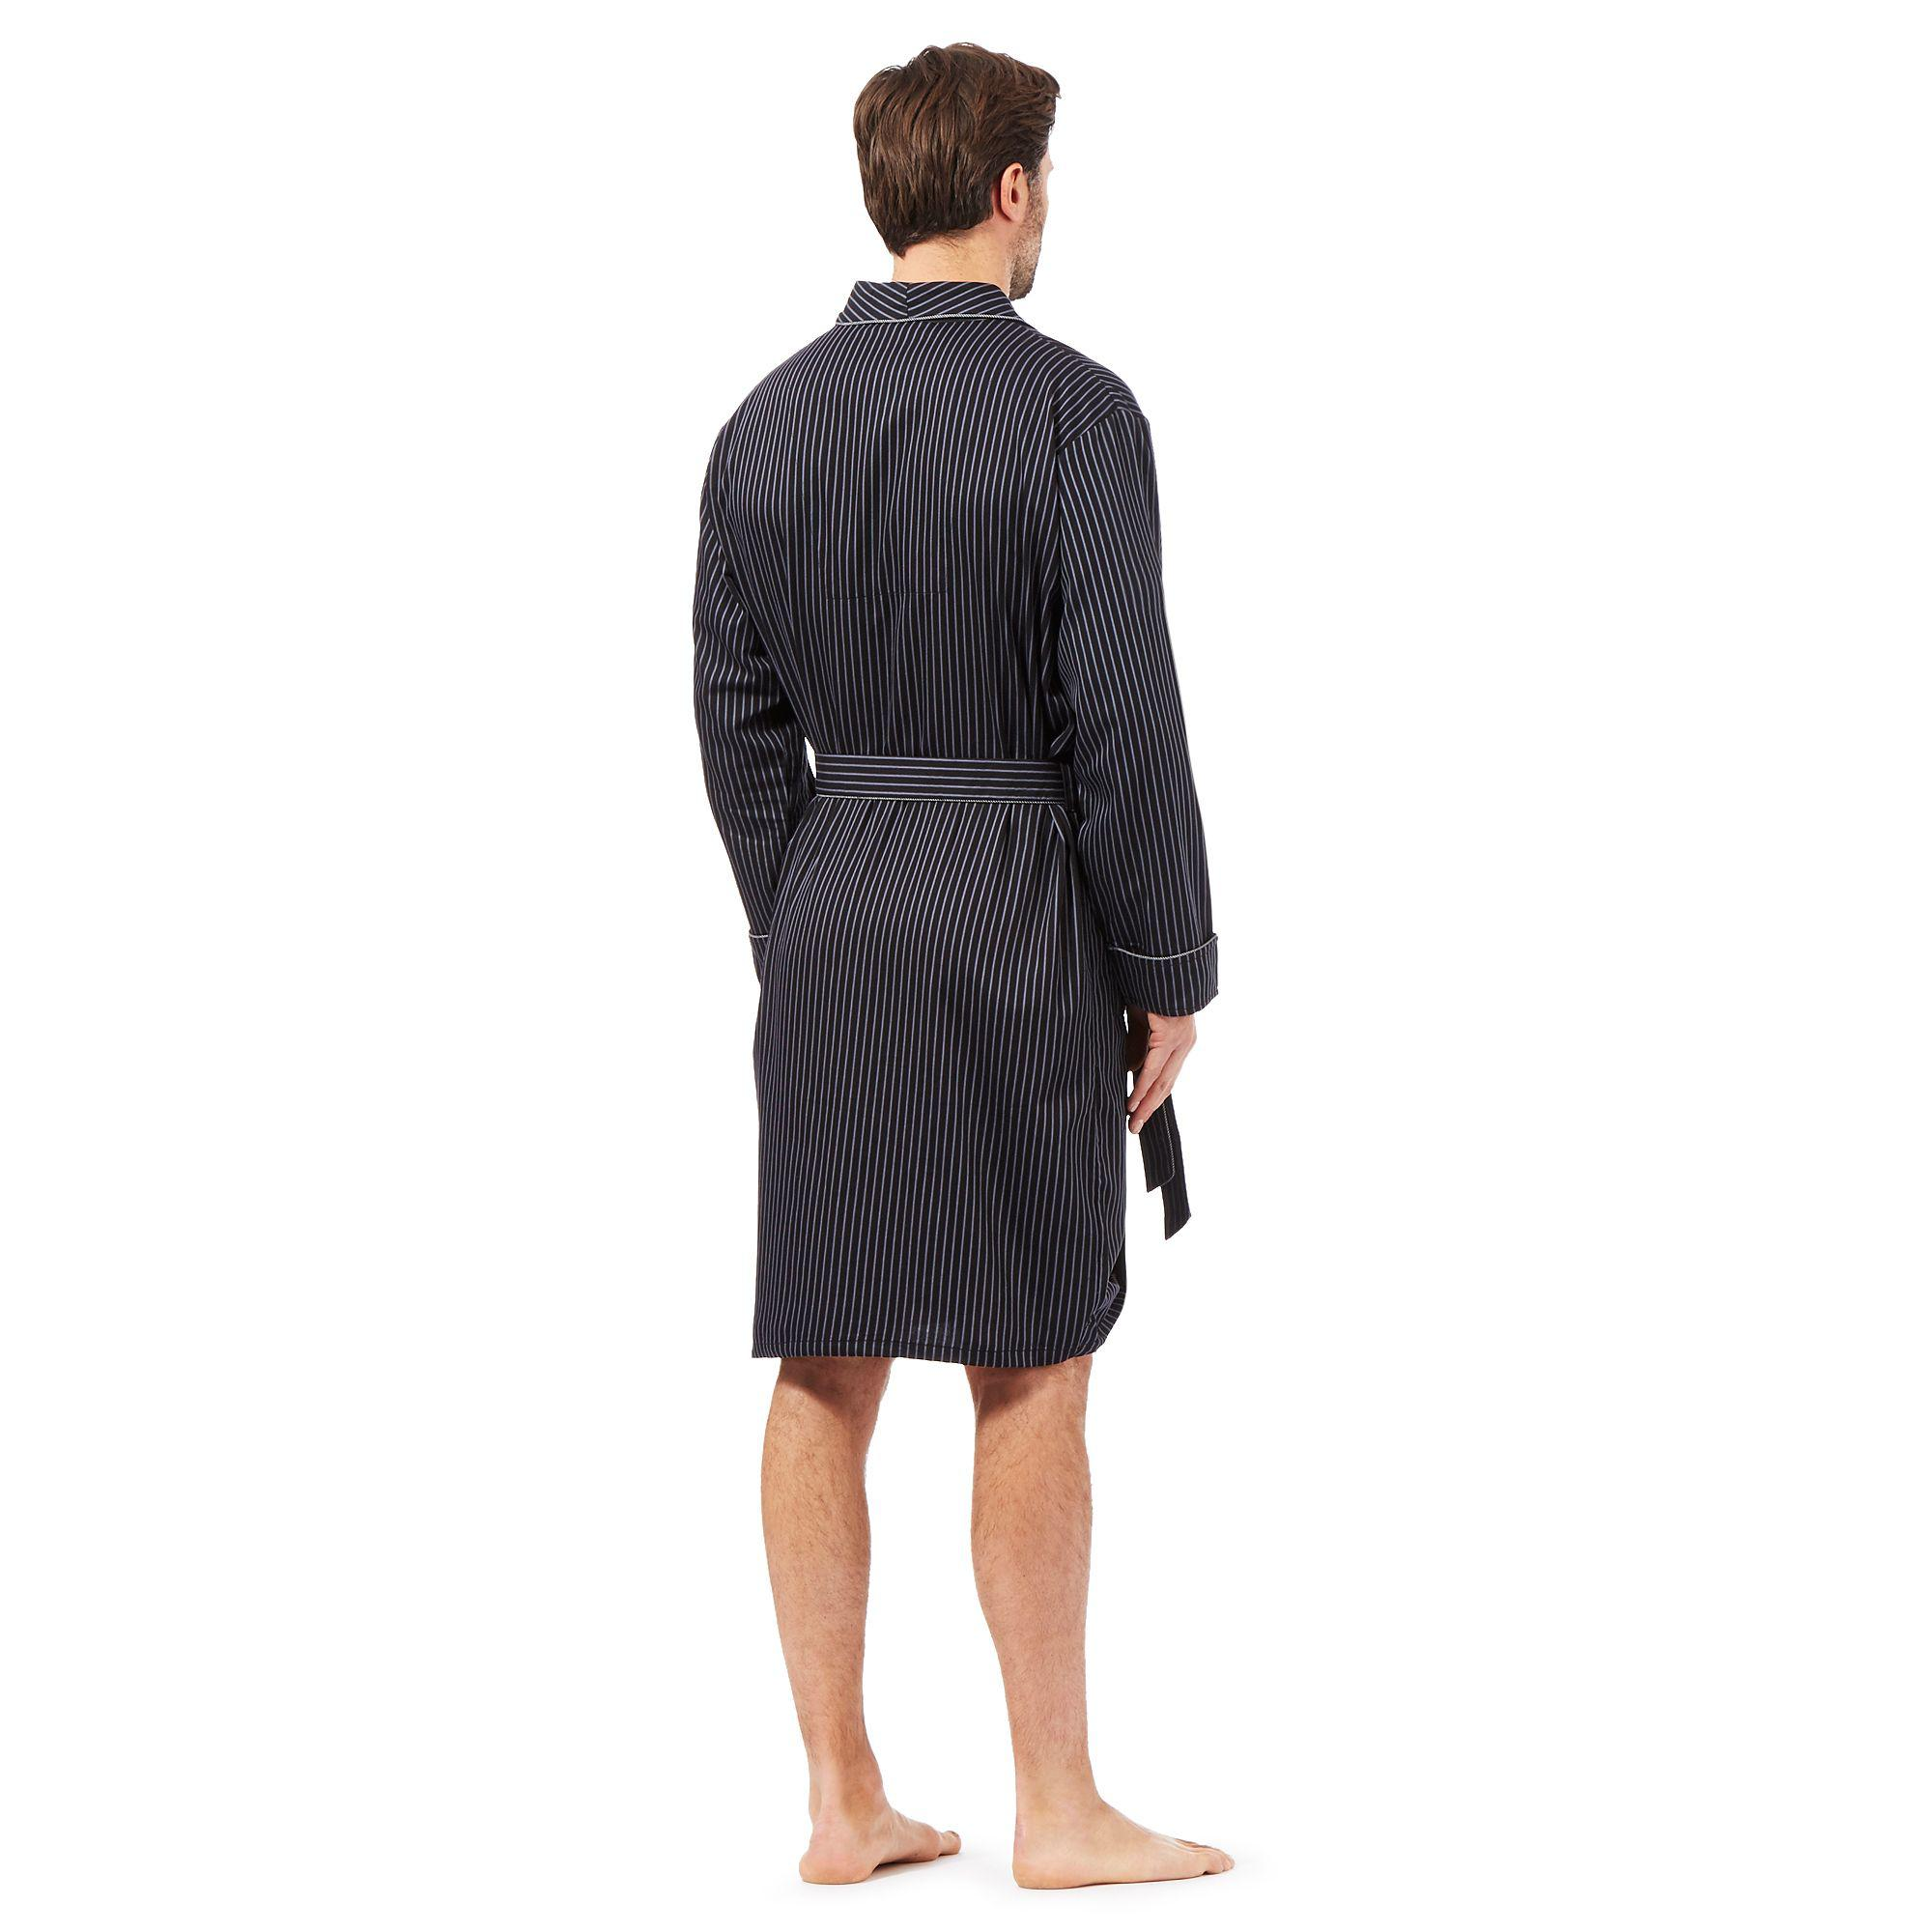 ce9c4a9eee J By Jasper Conran Designer Black Satin Stripe Dressing Gown in ...